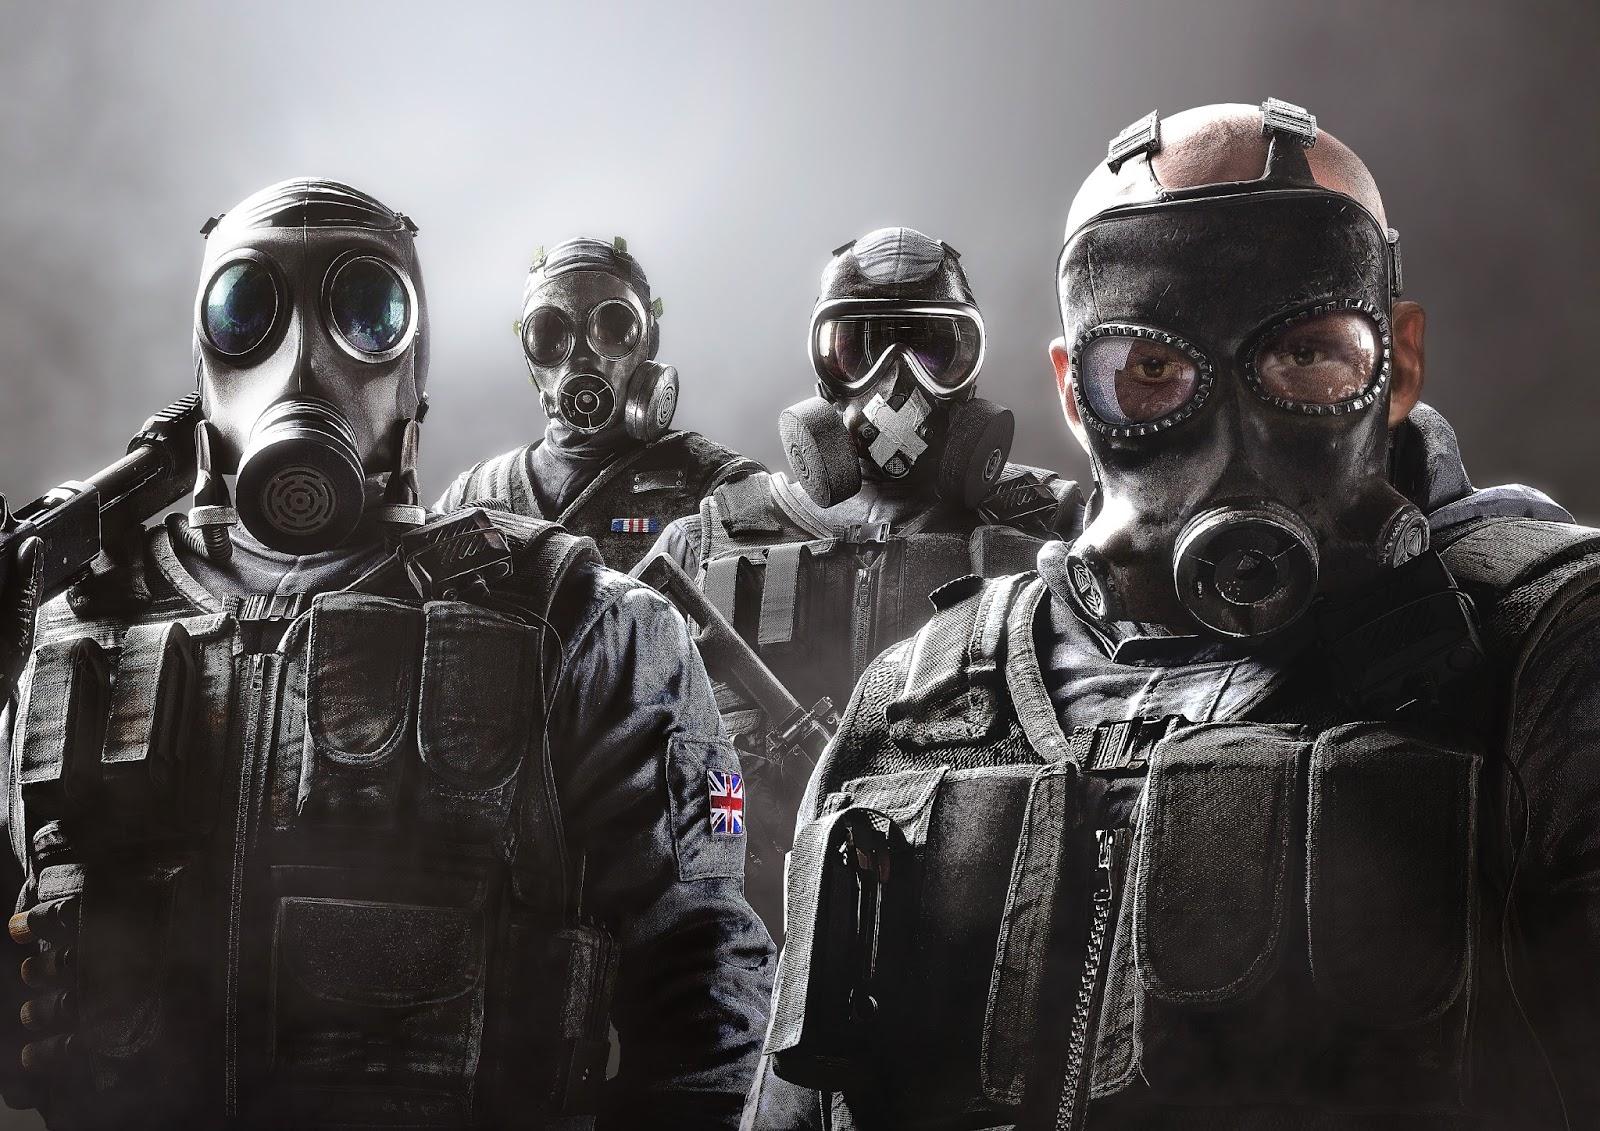 Tom Clancy's Rainbow Six: Siege – 4K Resolution Screenshots From The